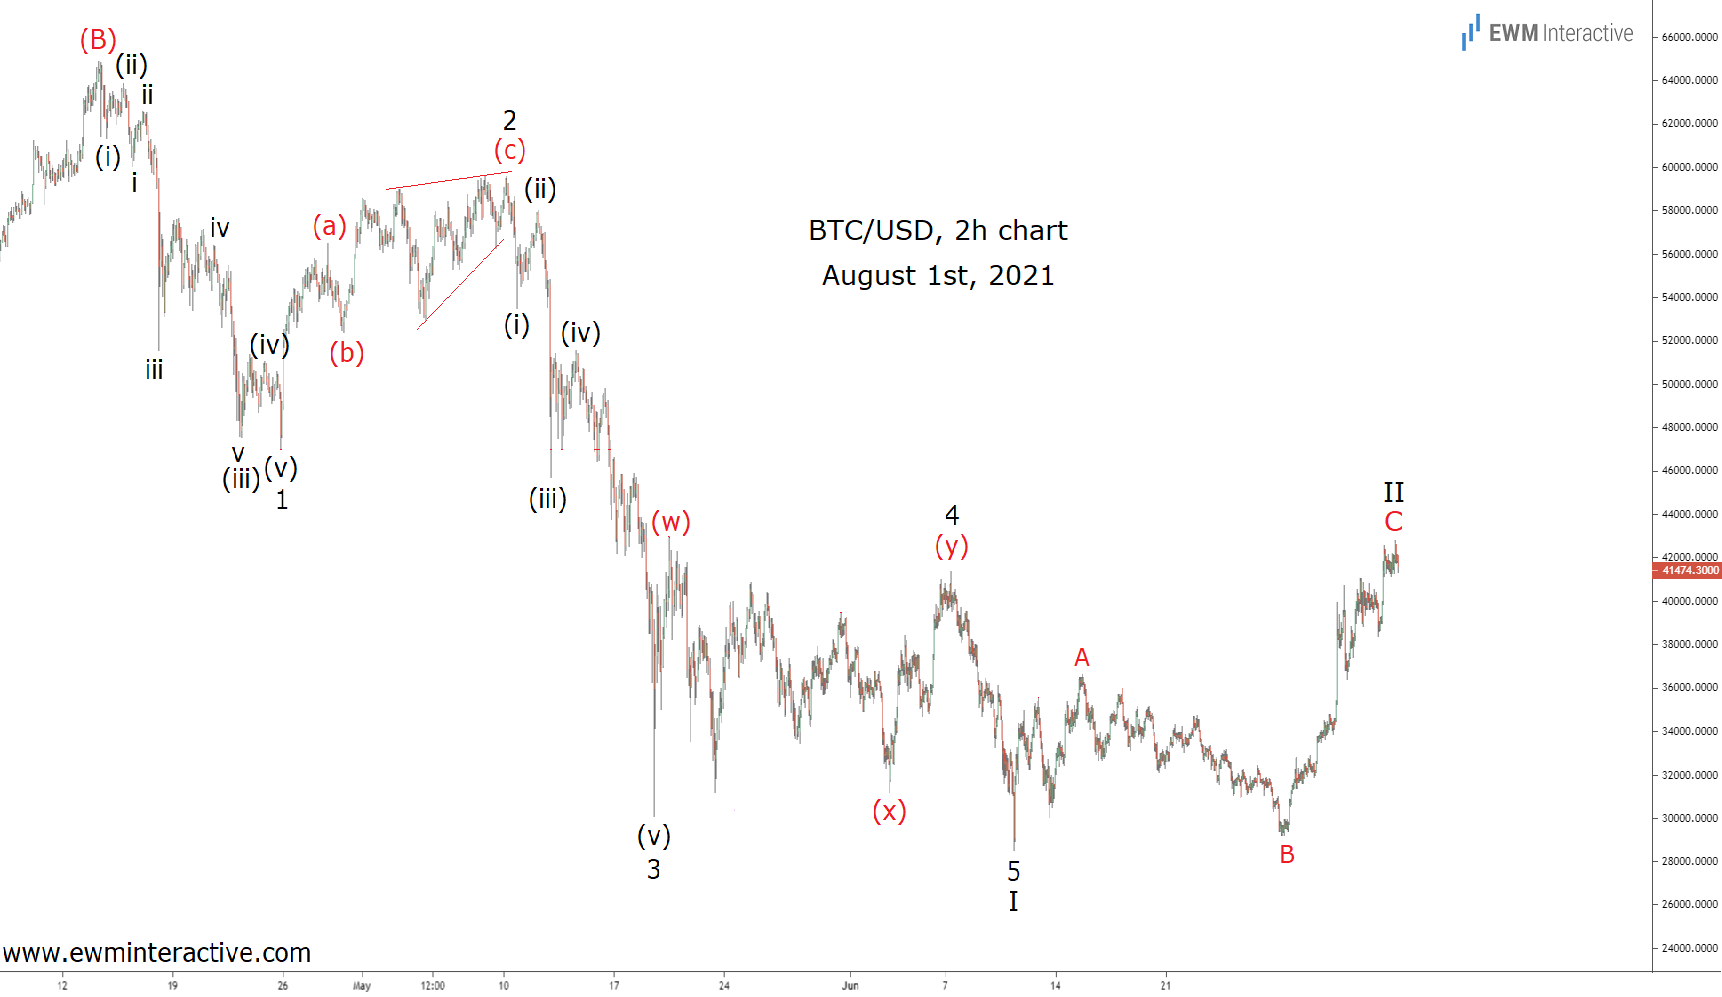 BTC/USD 2-Hr Chart - August 1st, 2021